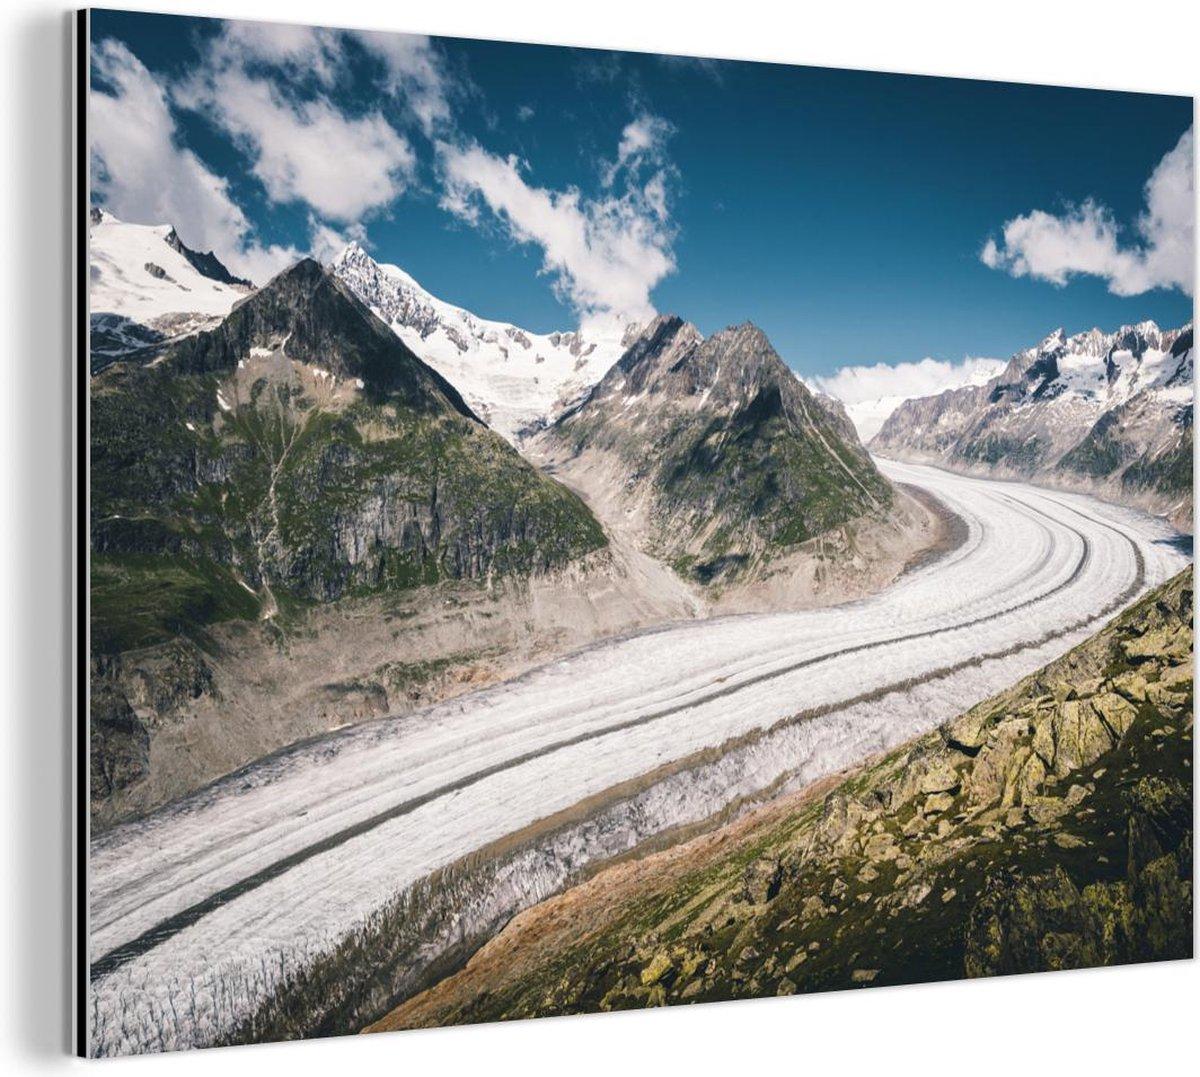 Europese Aletschgletsjer met blauwe lucht en wolken op de achtergrond Aluminium 30x20 cm - klein - Foto print op Aluminium (metaal wanddecoratie)